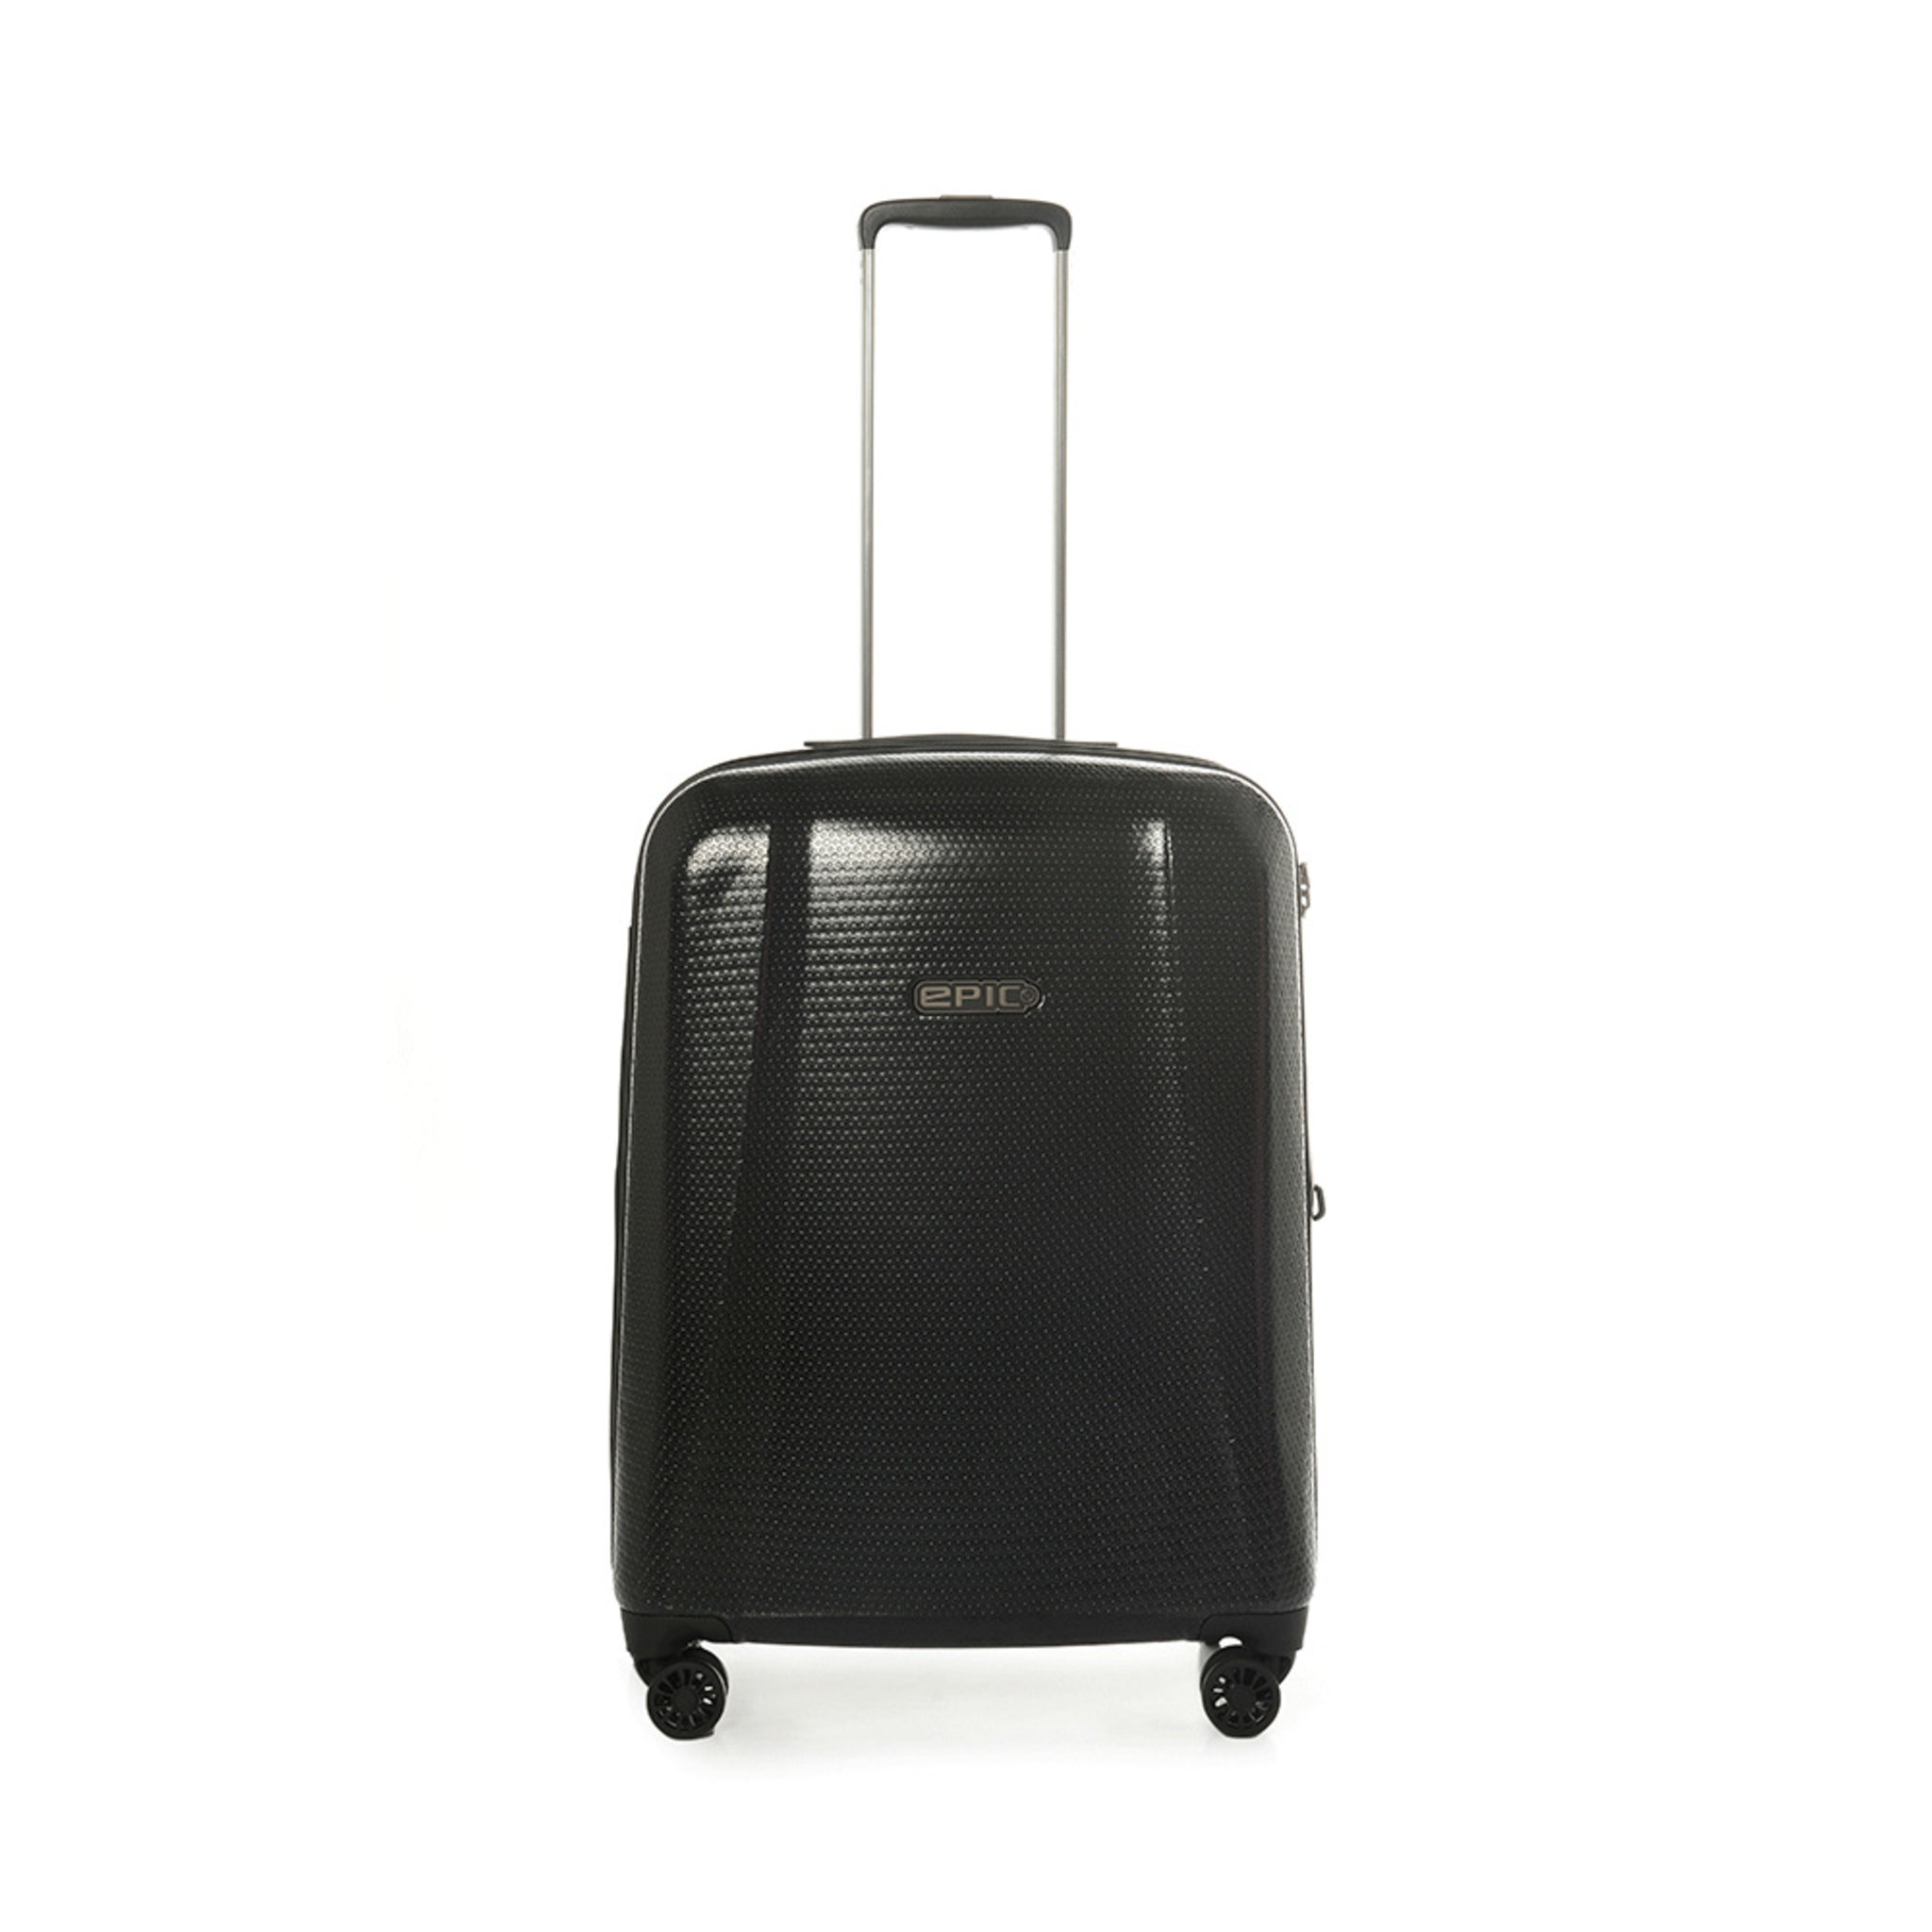 Resväskor - Väskor   plånböcker 6e66892c966a3